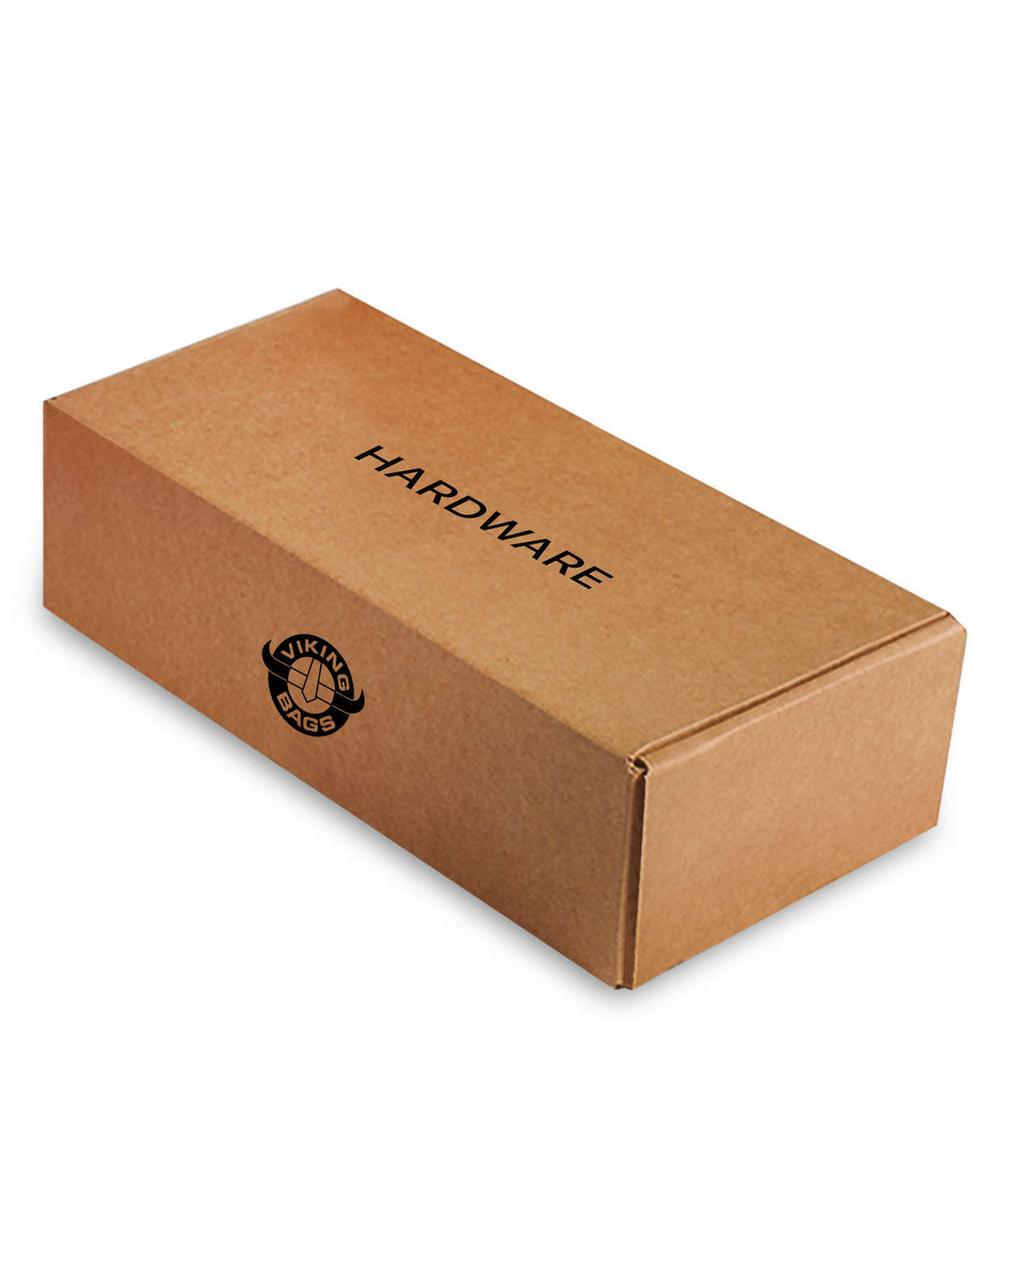 Viking Warrior Series Medium Motorcycle Saddlebags For Harley Softail Breakout Hardware Box